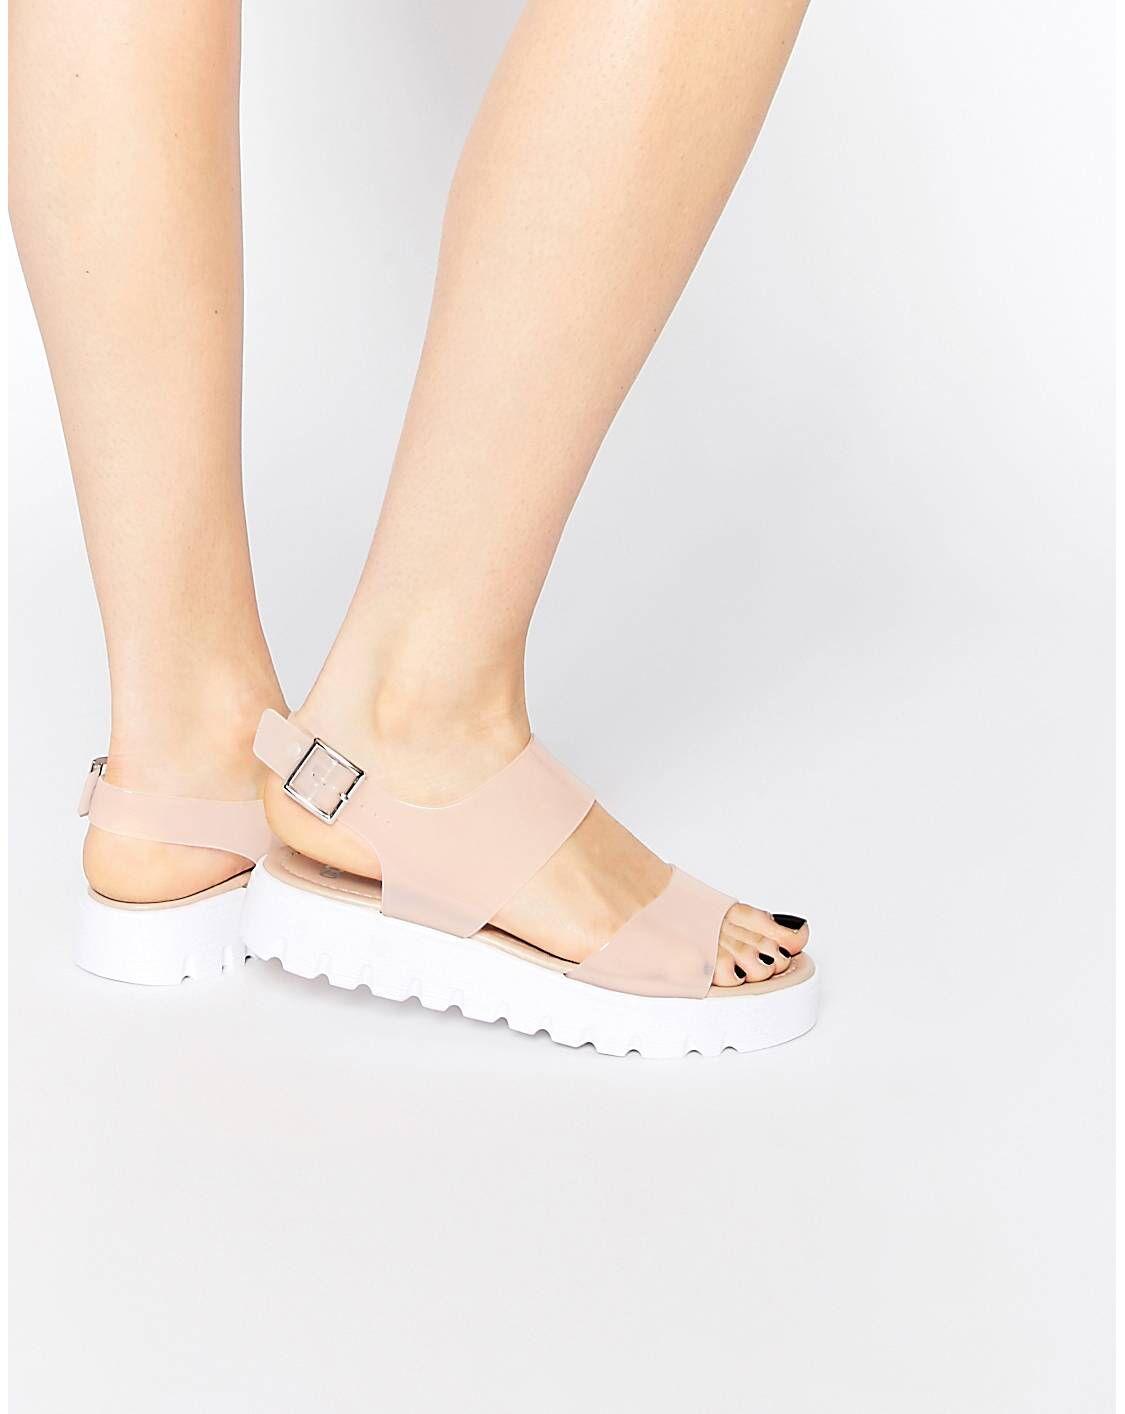 FLYNN Sandales souples | Sandales, Chaussures sandales